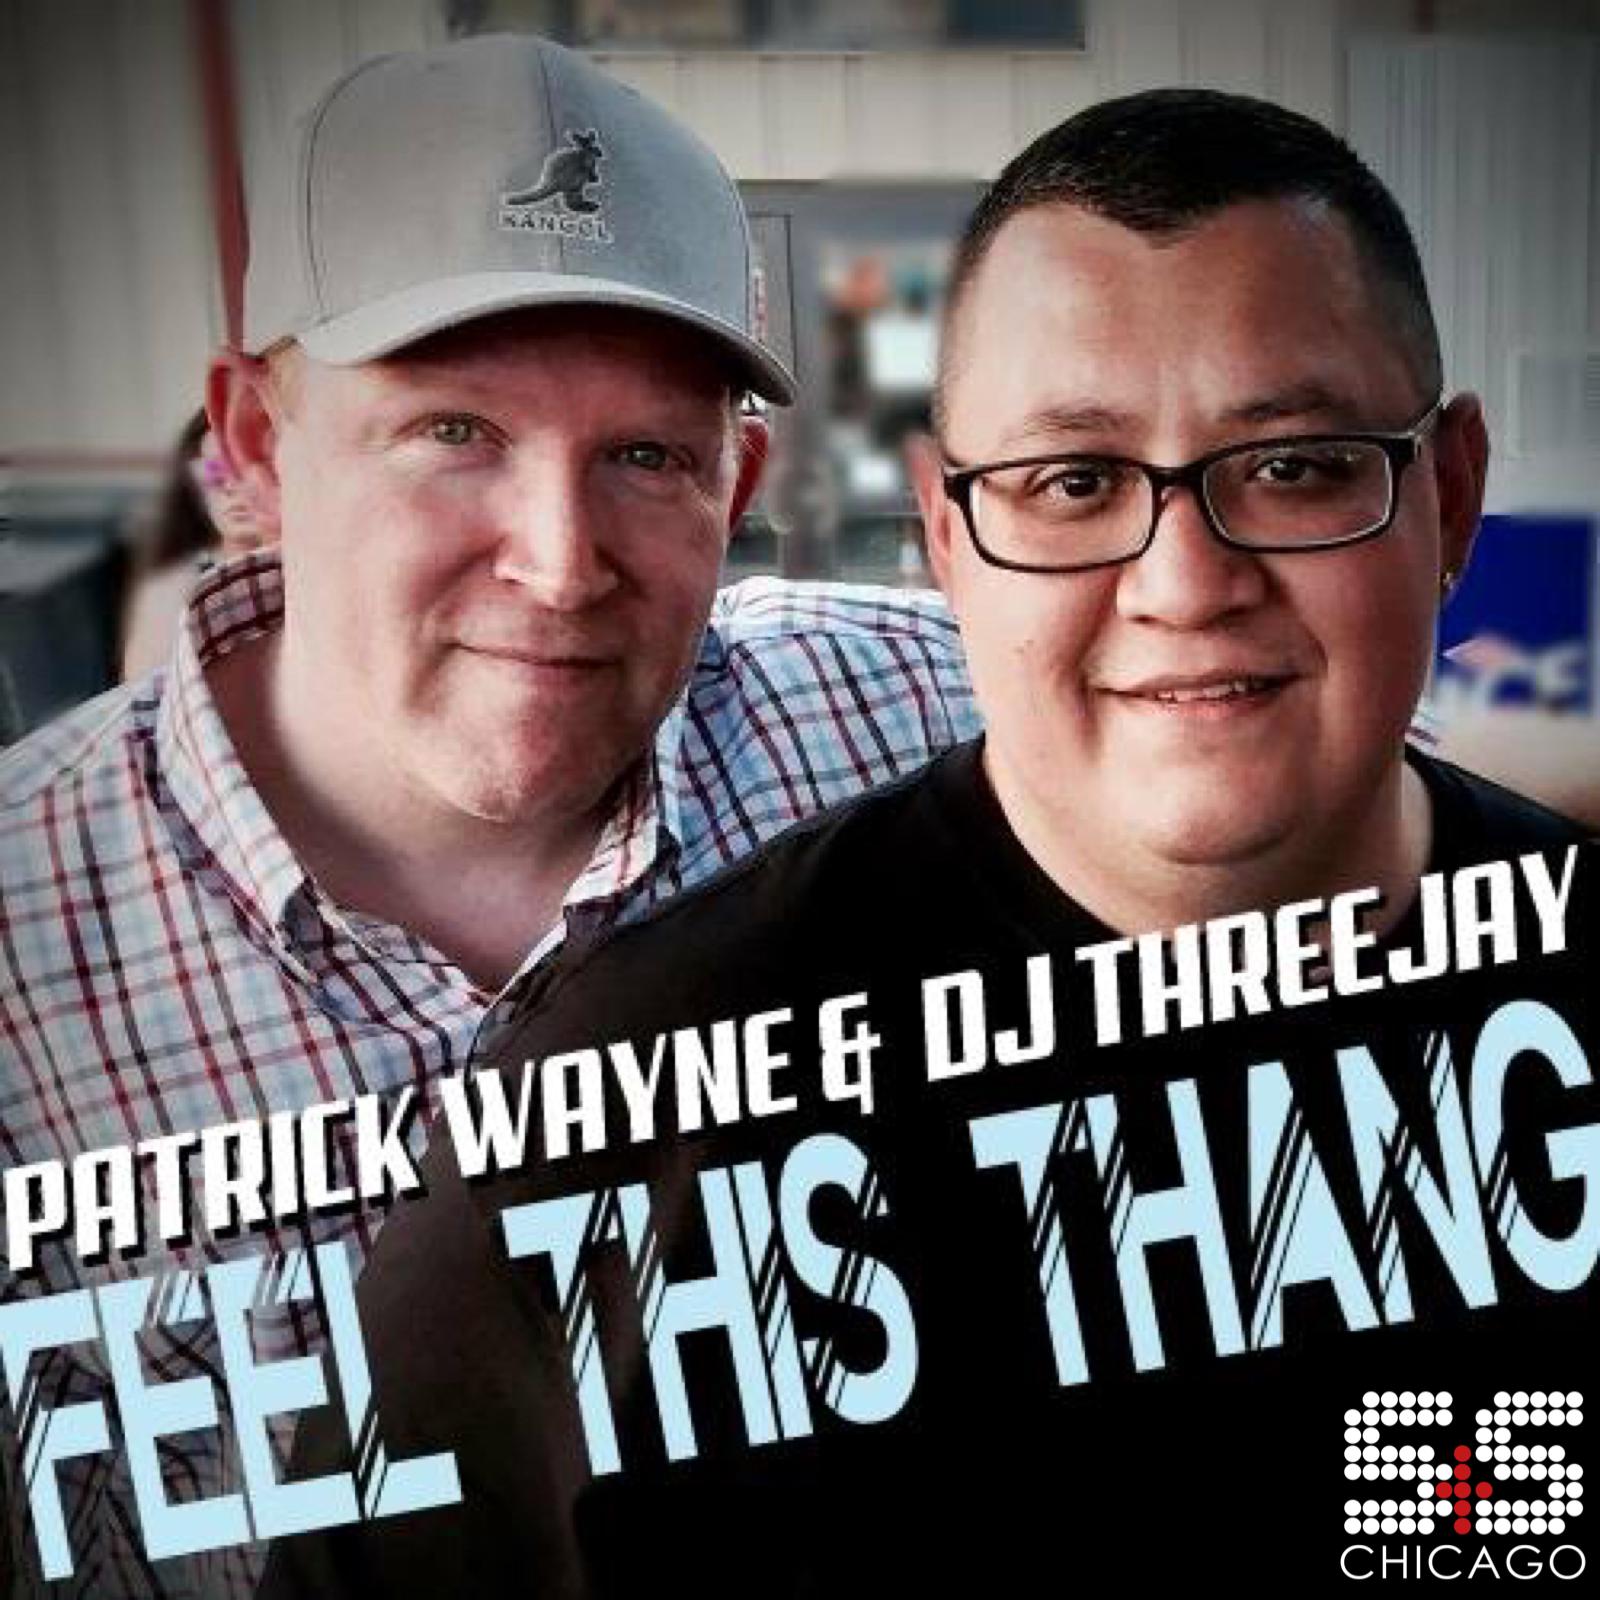 DJ Threejay & Patrick Wayne - Feel This Thang